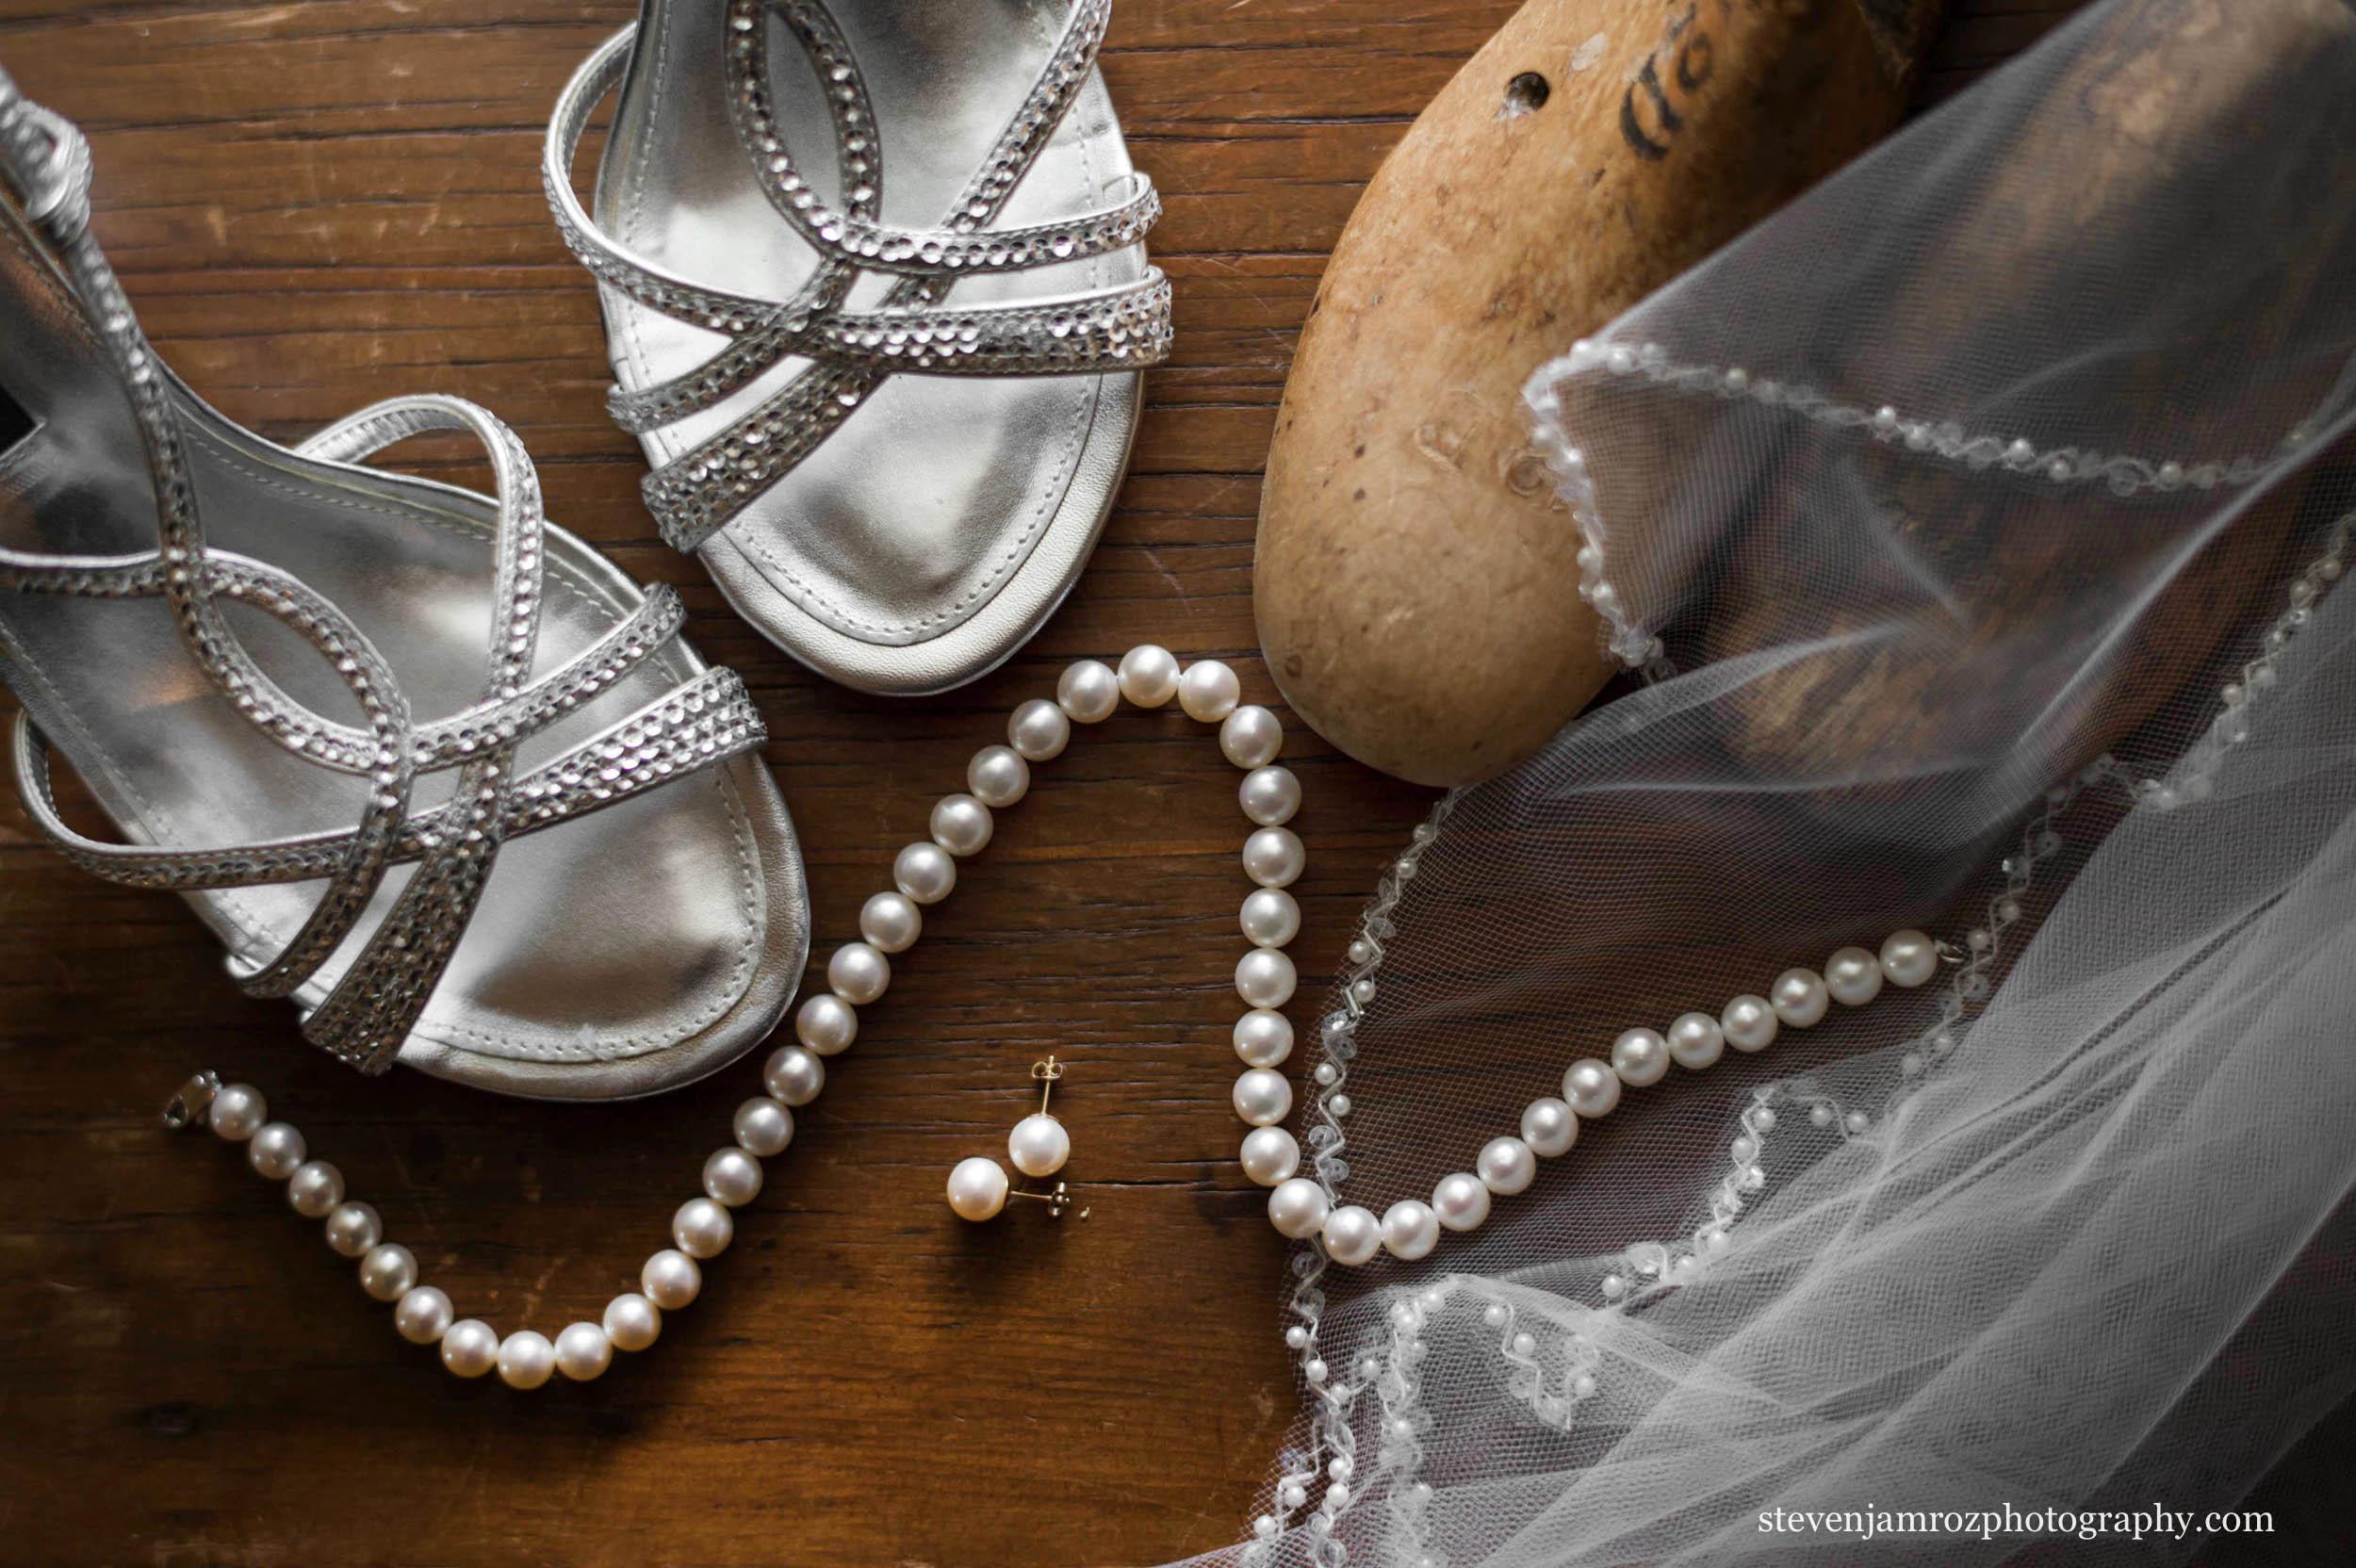 lace-veil-necklace-wedding-raleigh-steven-jamroz-photography-0342.jpg